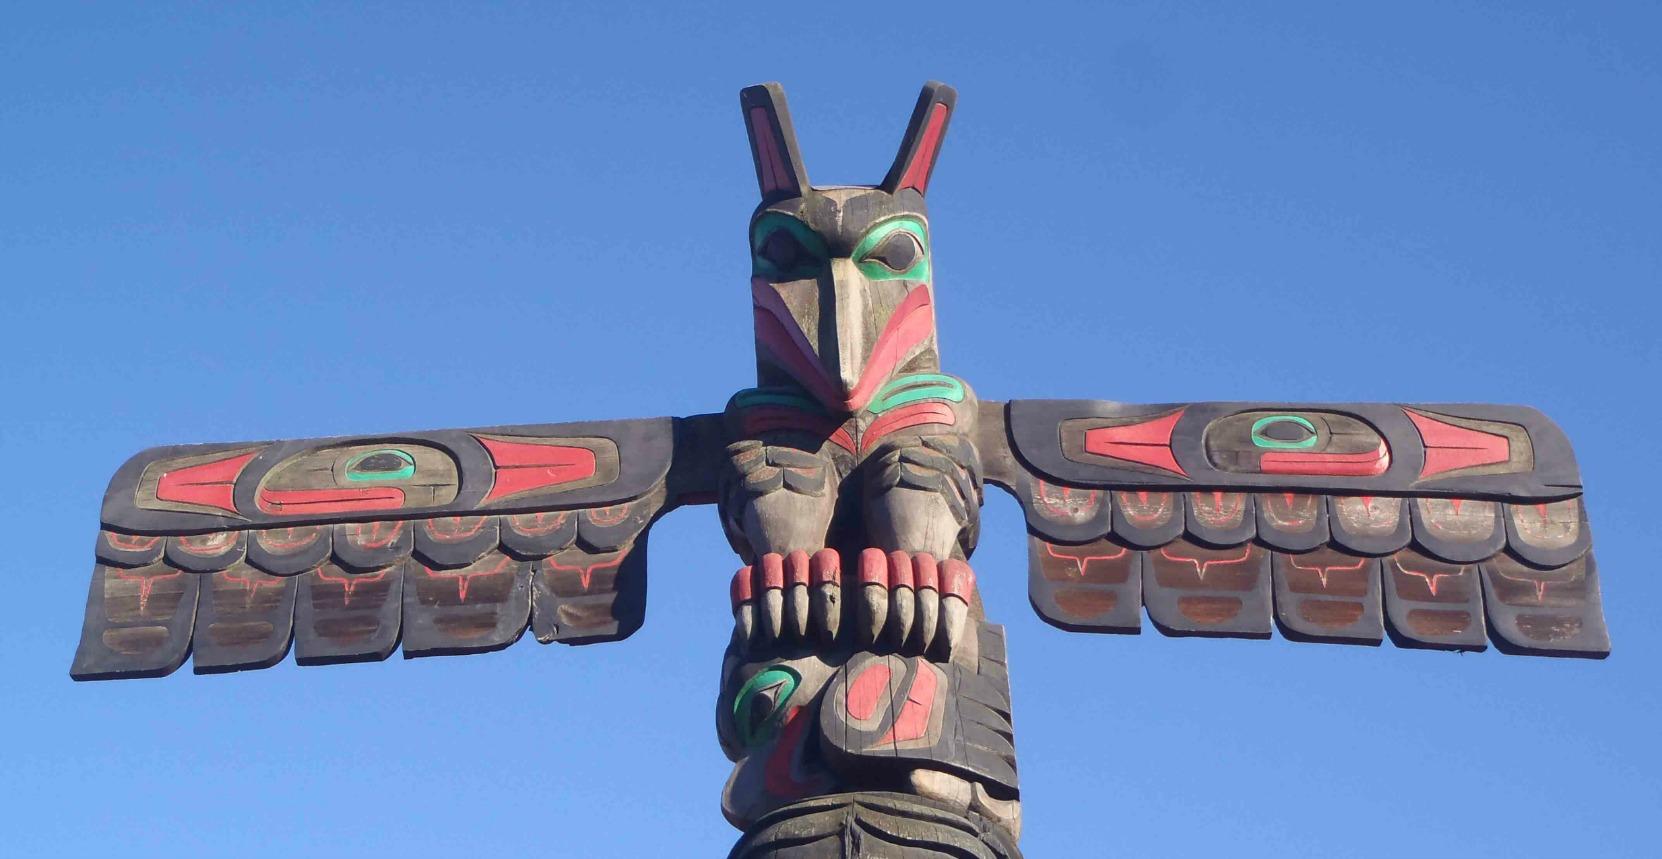 Raven's Gift totem pole, Raven figure, Canada Avenue, Duncan, B.C.